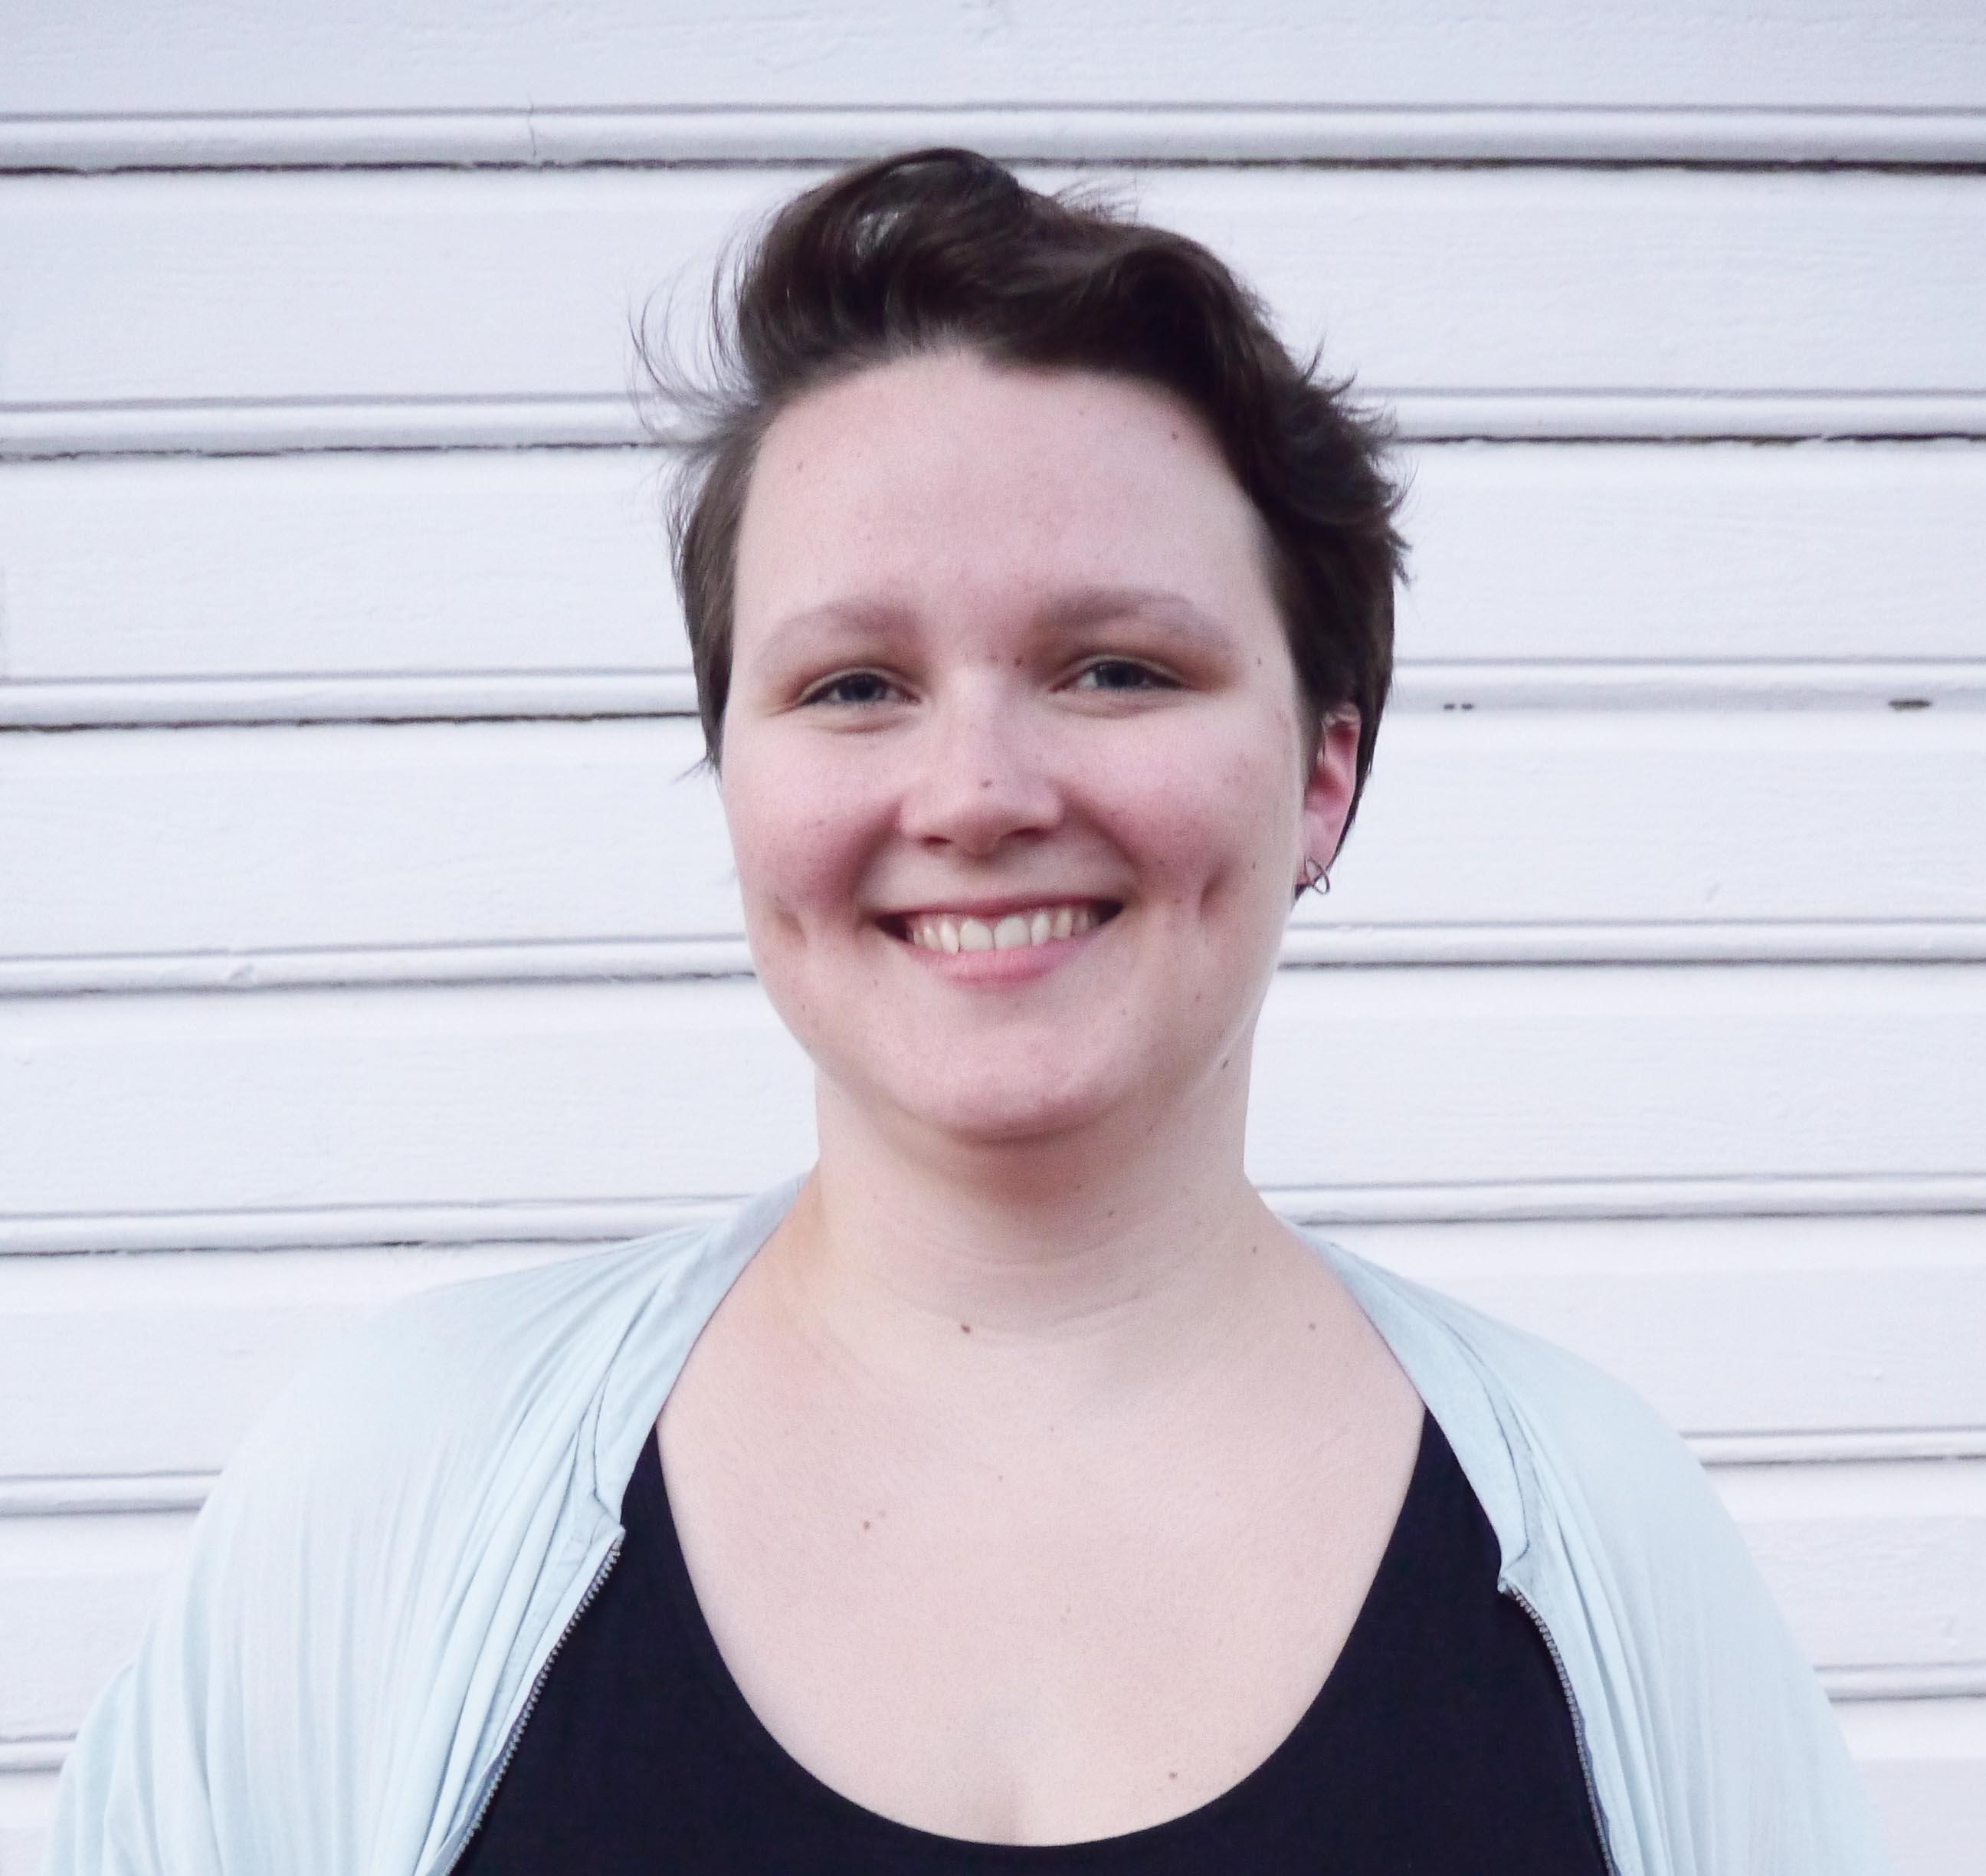 SKÅL: Anna Willrodt, Prosjektleder I SØRF, Inviterer Til Lønningspils For Musikere.